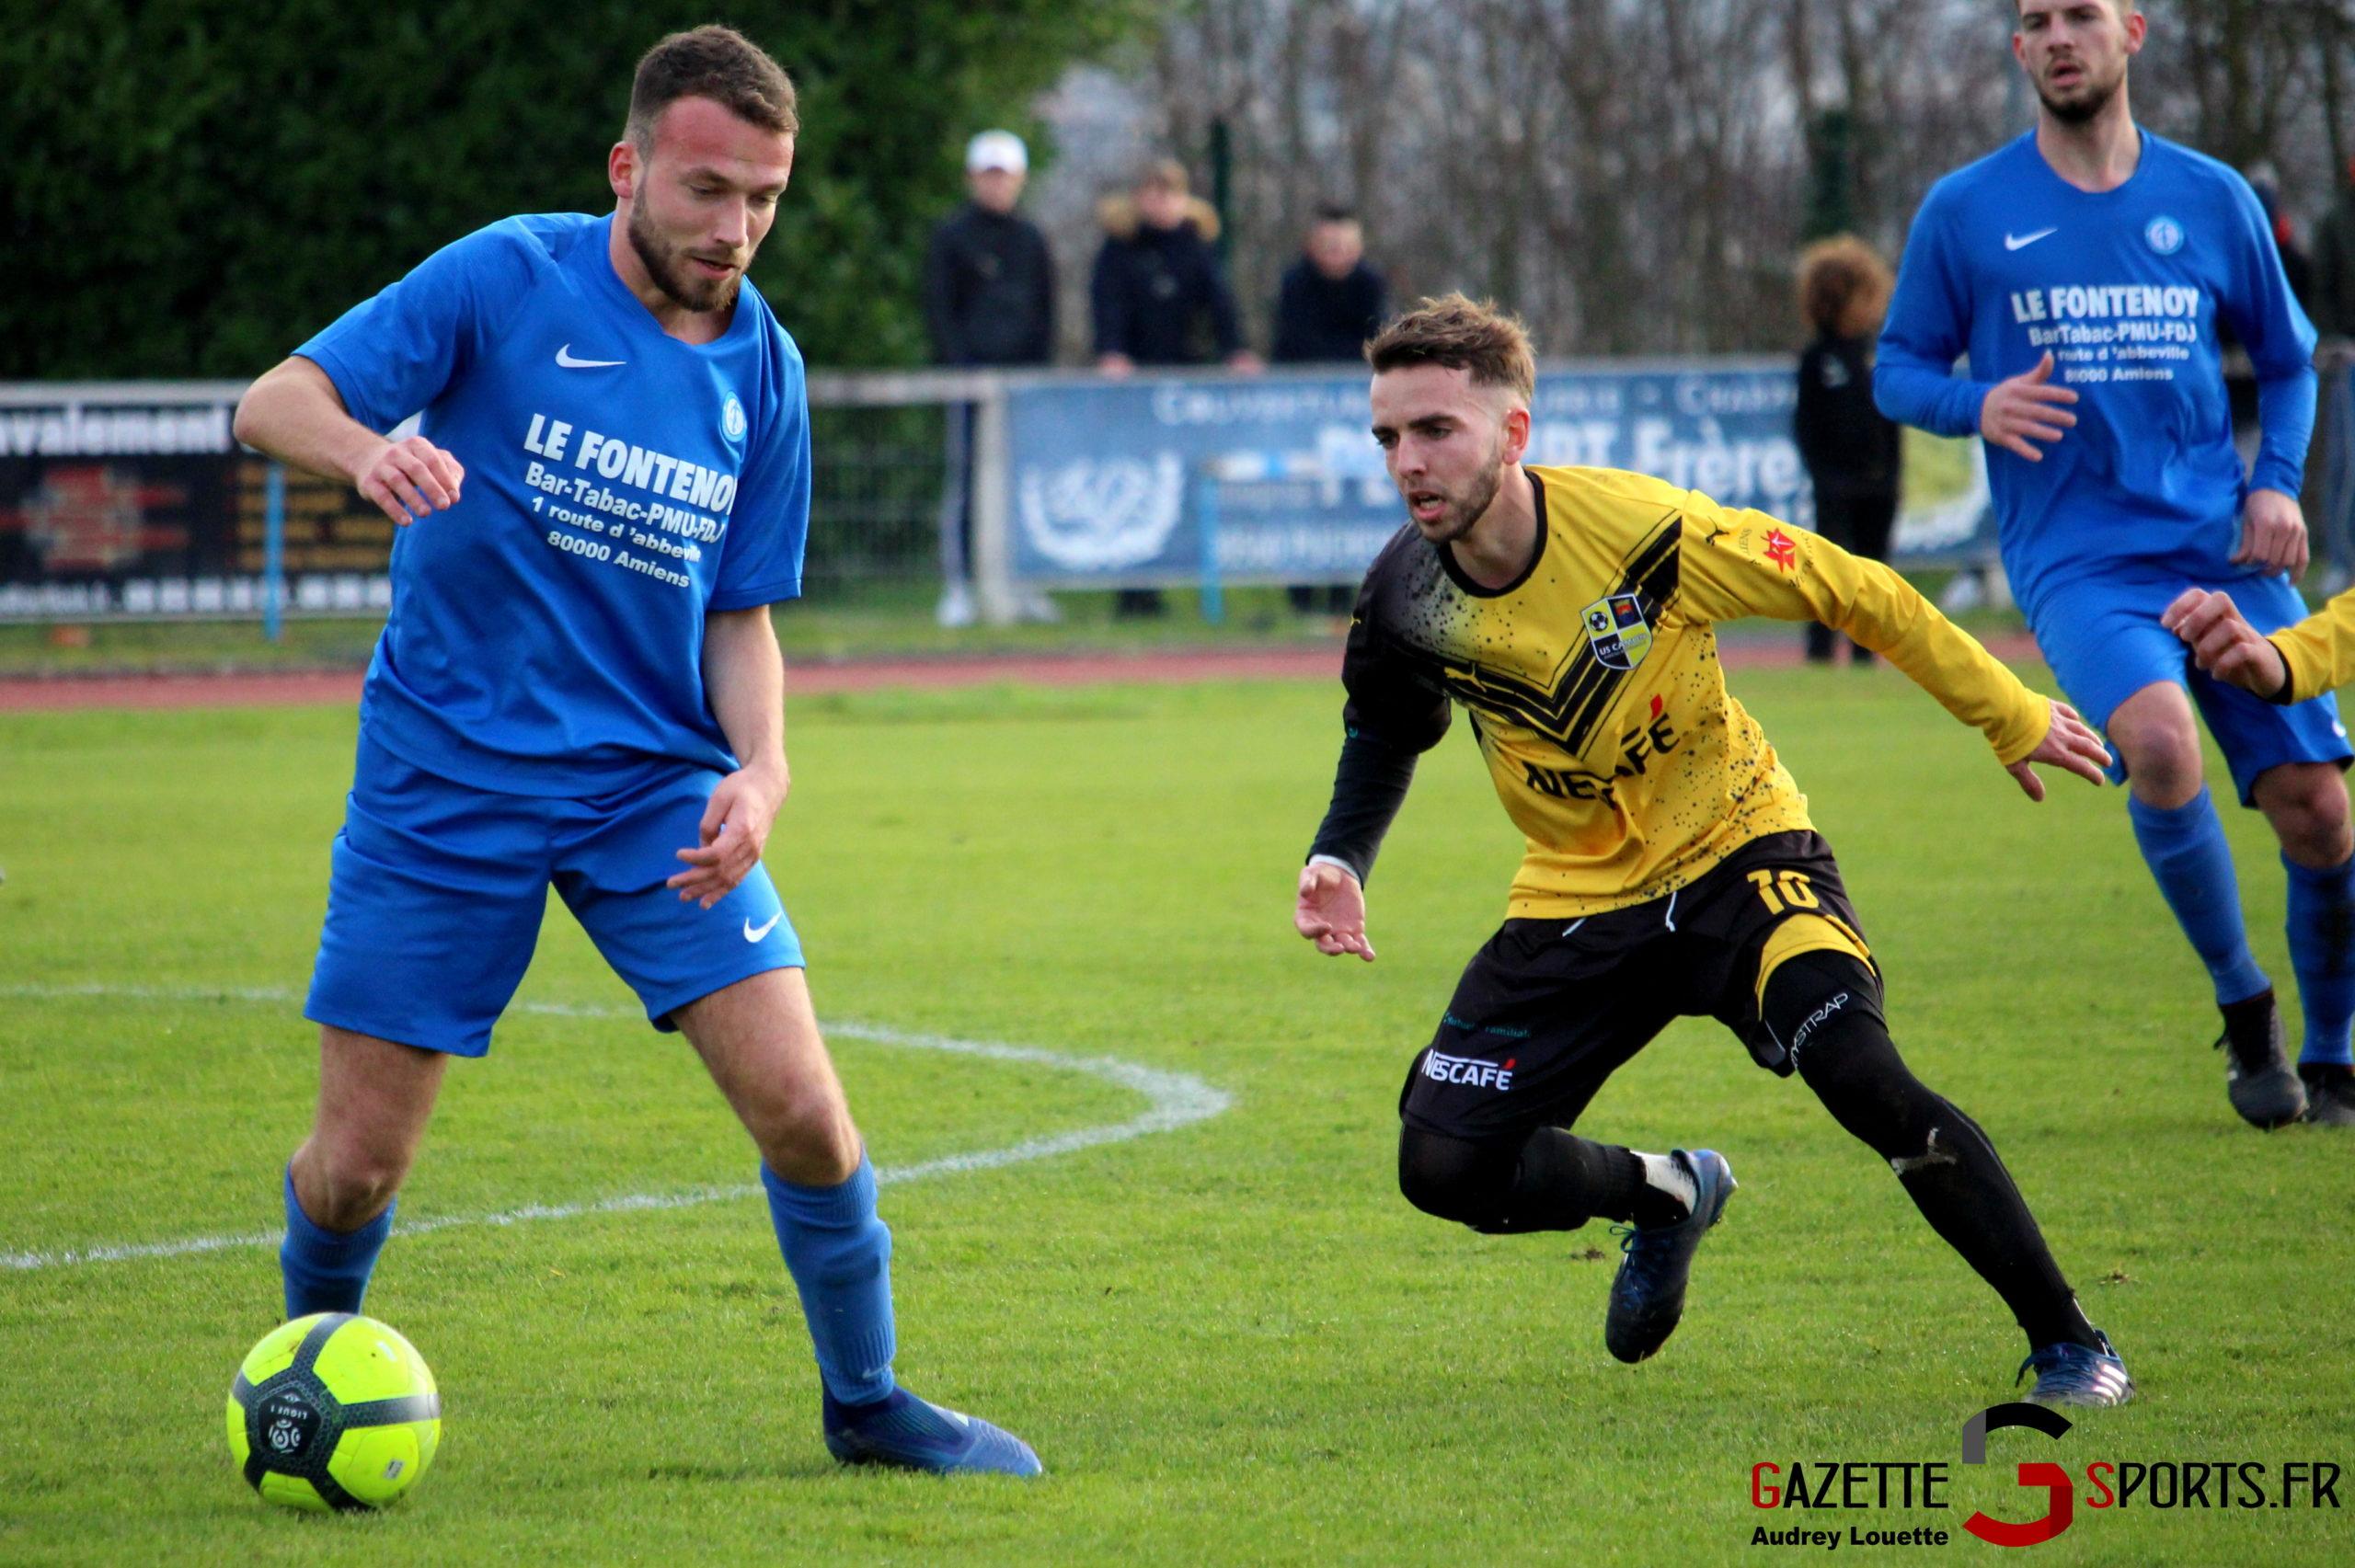 Football Camon Vs Longueau Audrey Louette Gazettesports (47)